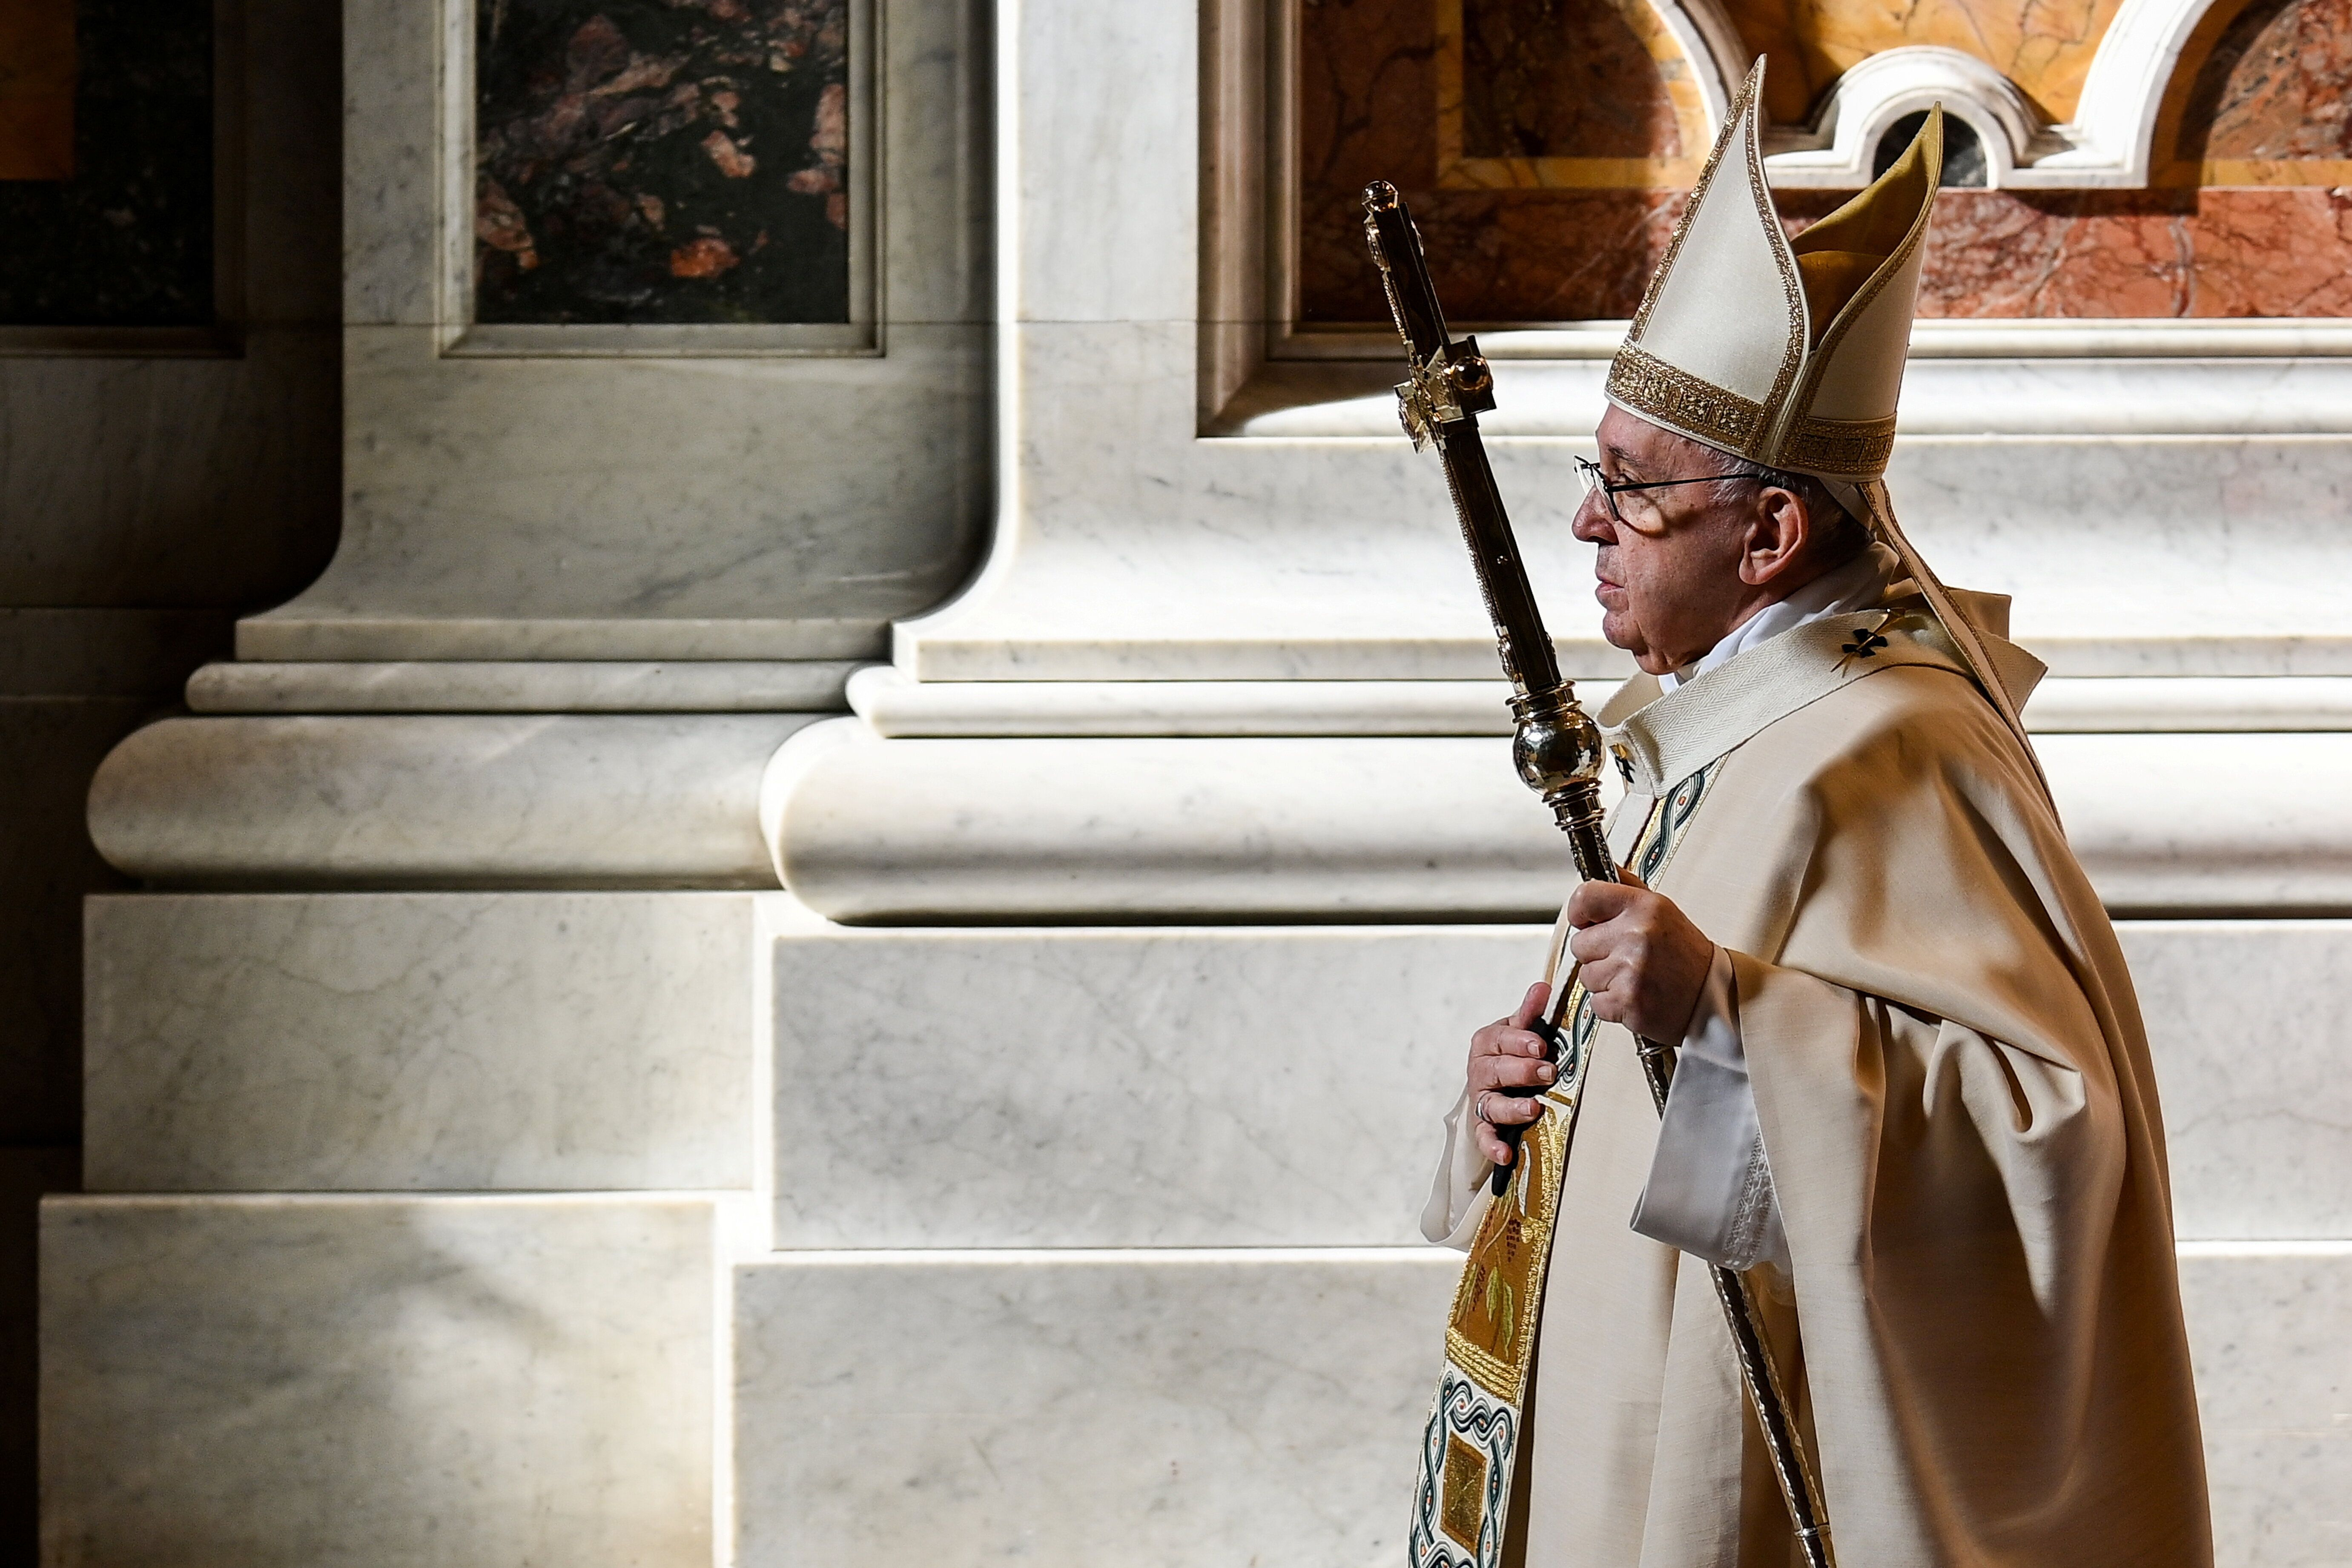 Pope Francis celebrates Mass at St. Peter's Basilica, at the Vatican, November 22, 2020.